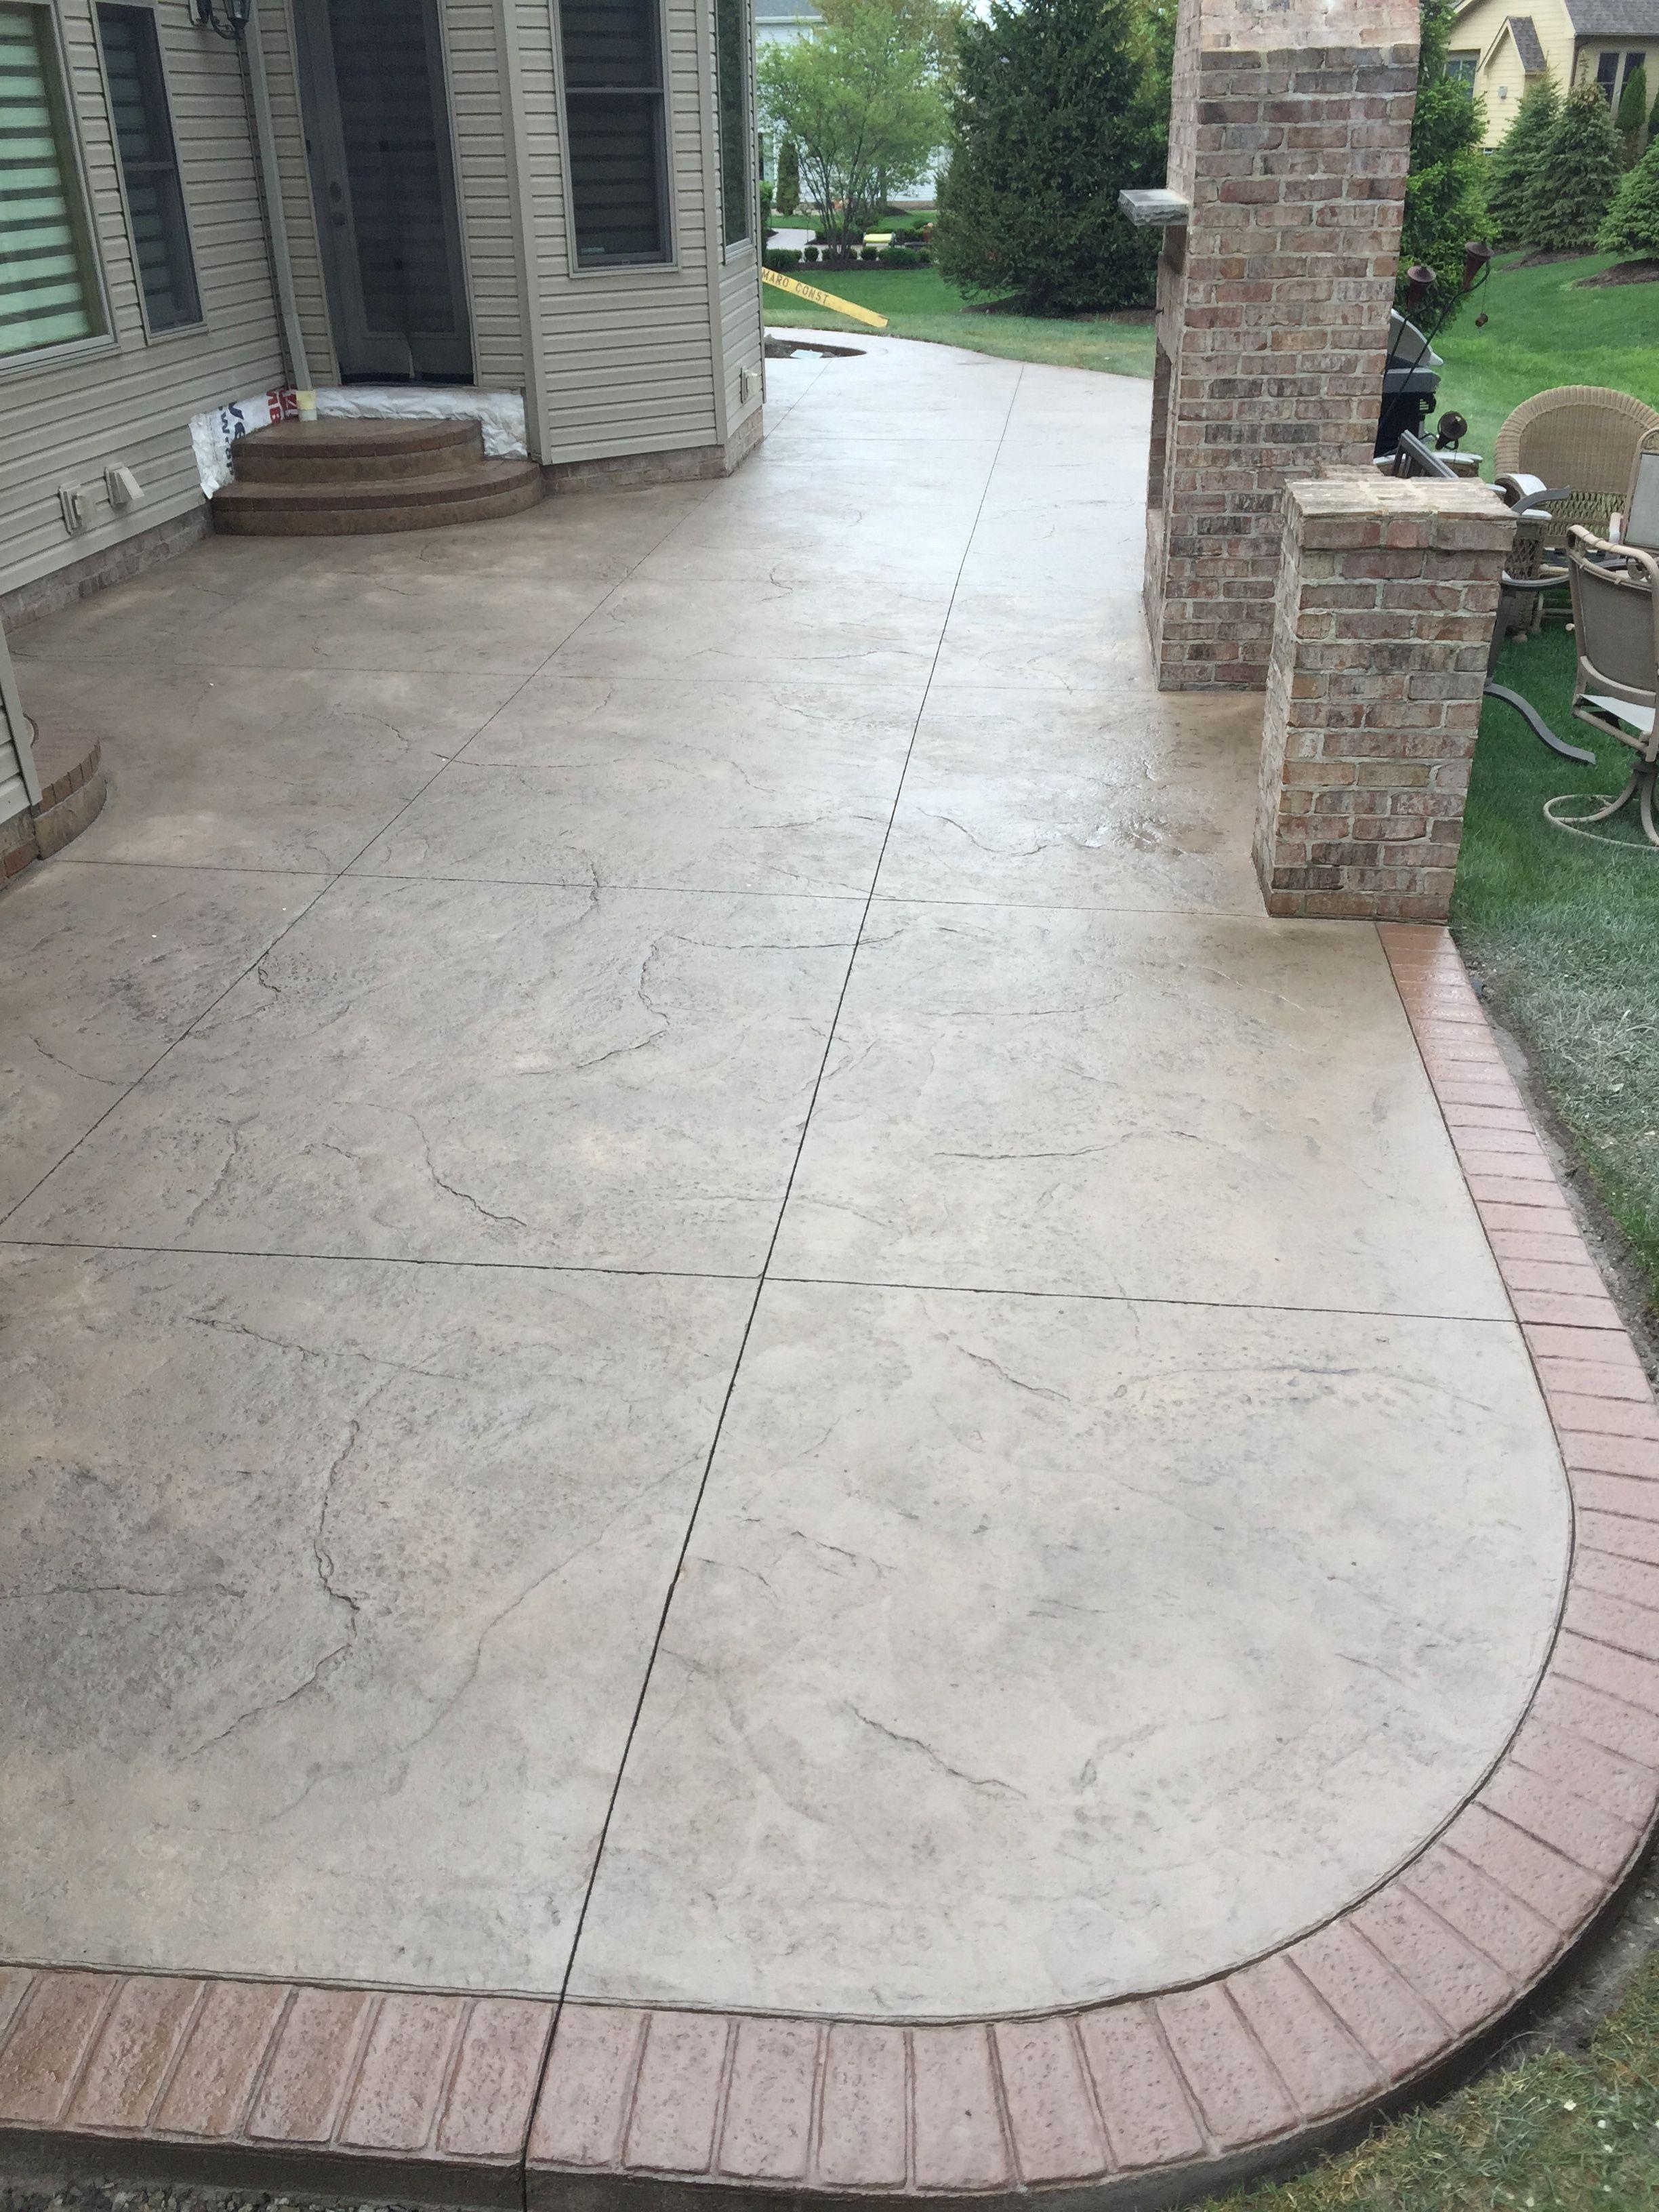 Stamped Patio W 2 Sets Of Landings Steps W Matching Brick Borders Facing On Landings Ste Concrete Patio Designs Cement Patio Stamped Concrete Patio Designs